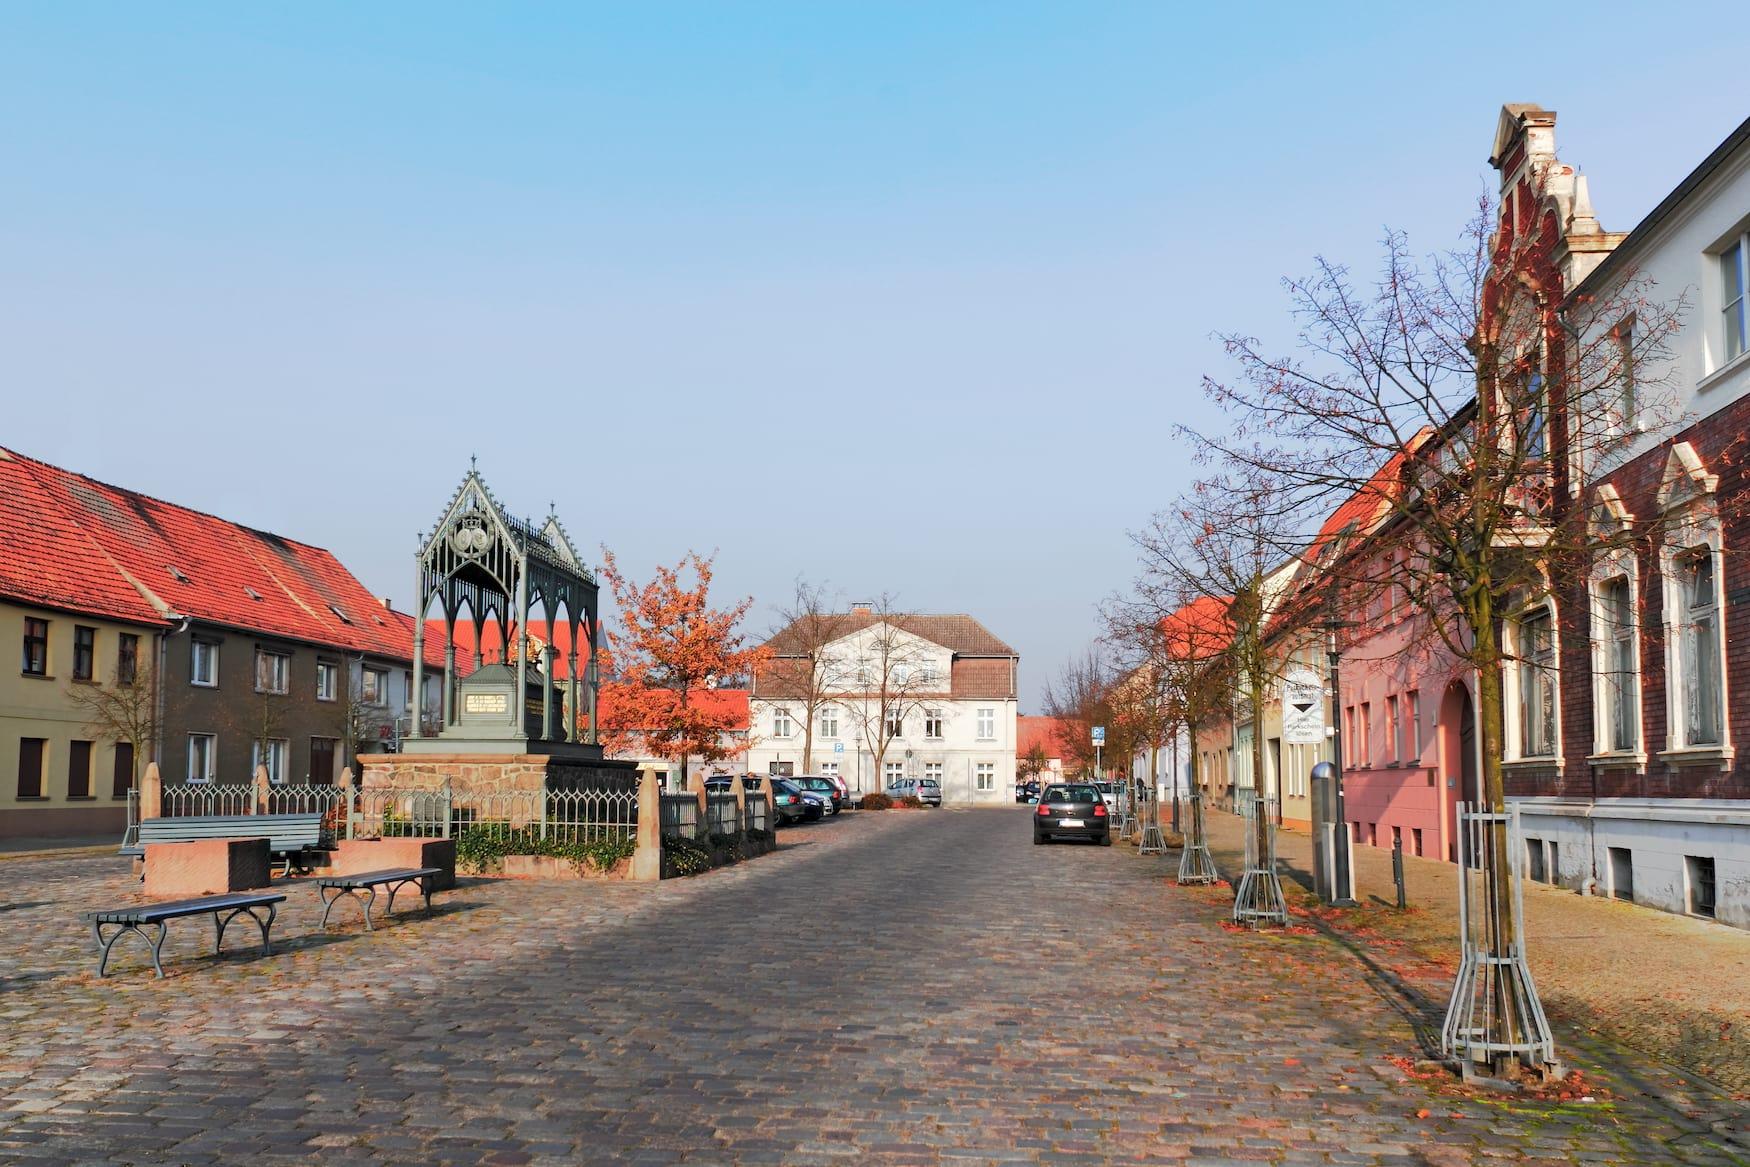 Gransee in Brandenburg